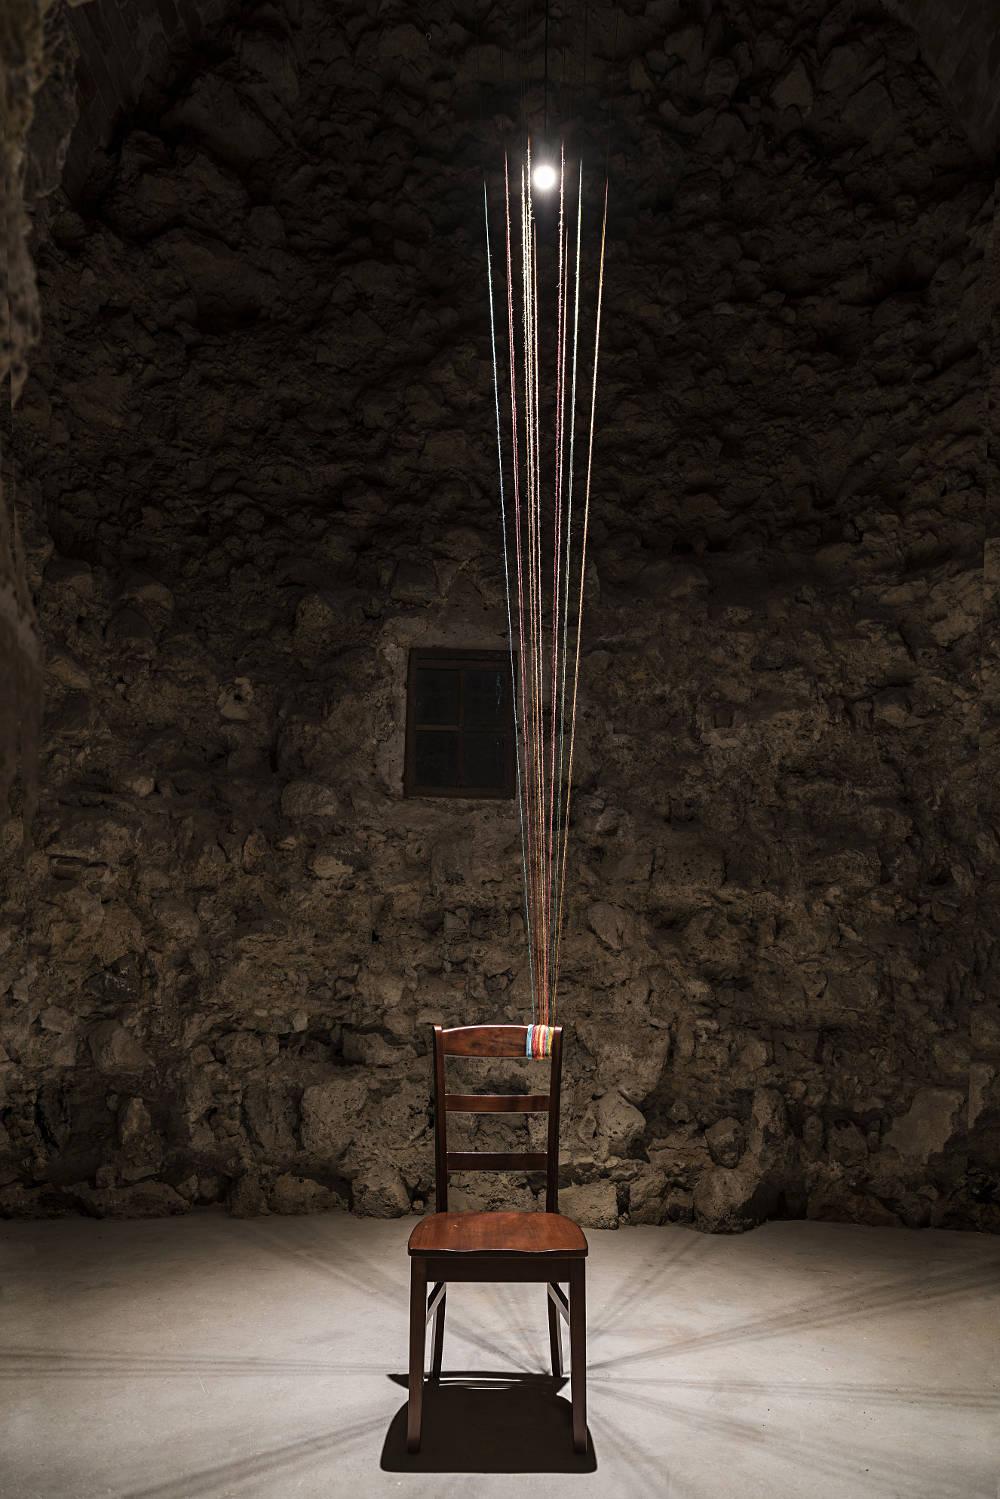 Galleria Continua San Gimignano Ilya Emilia Kabakov 2019 1